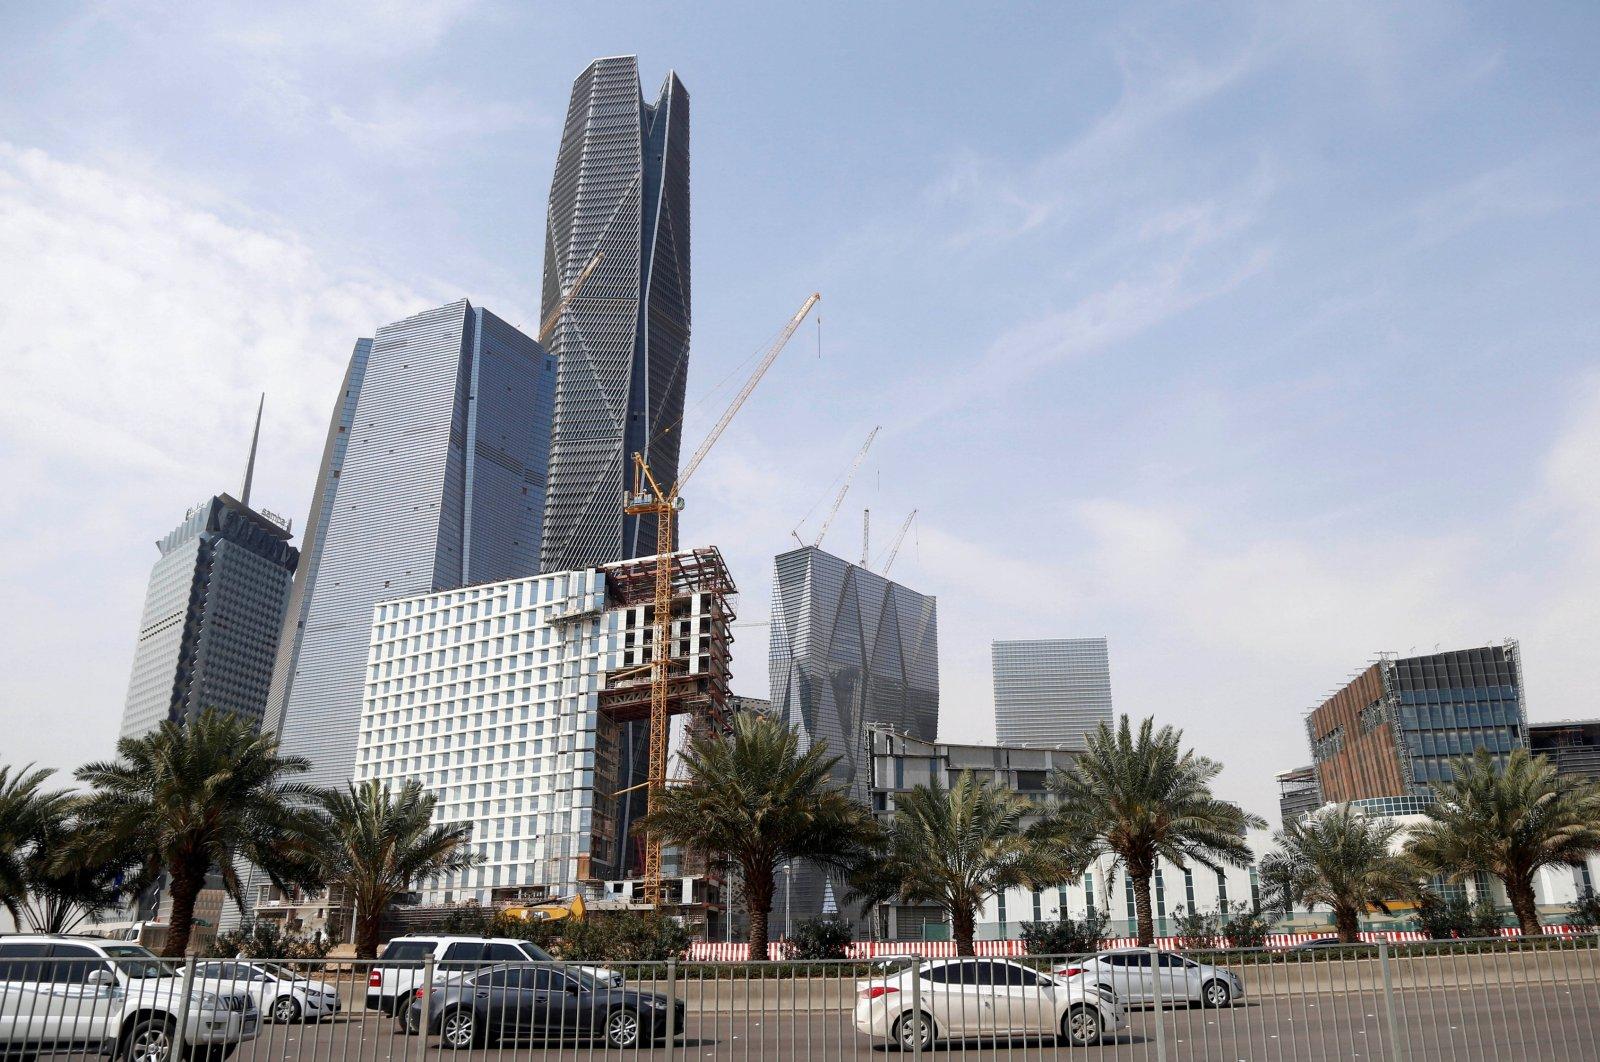 Cars drive past the King Abdullah Financial District, north of Riyadh, Saudi Arabia, March 1, 2017. (Reuters Photo)